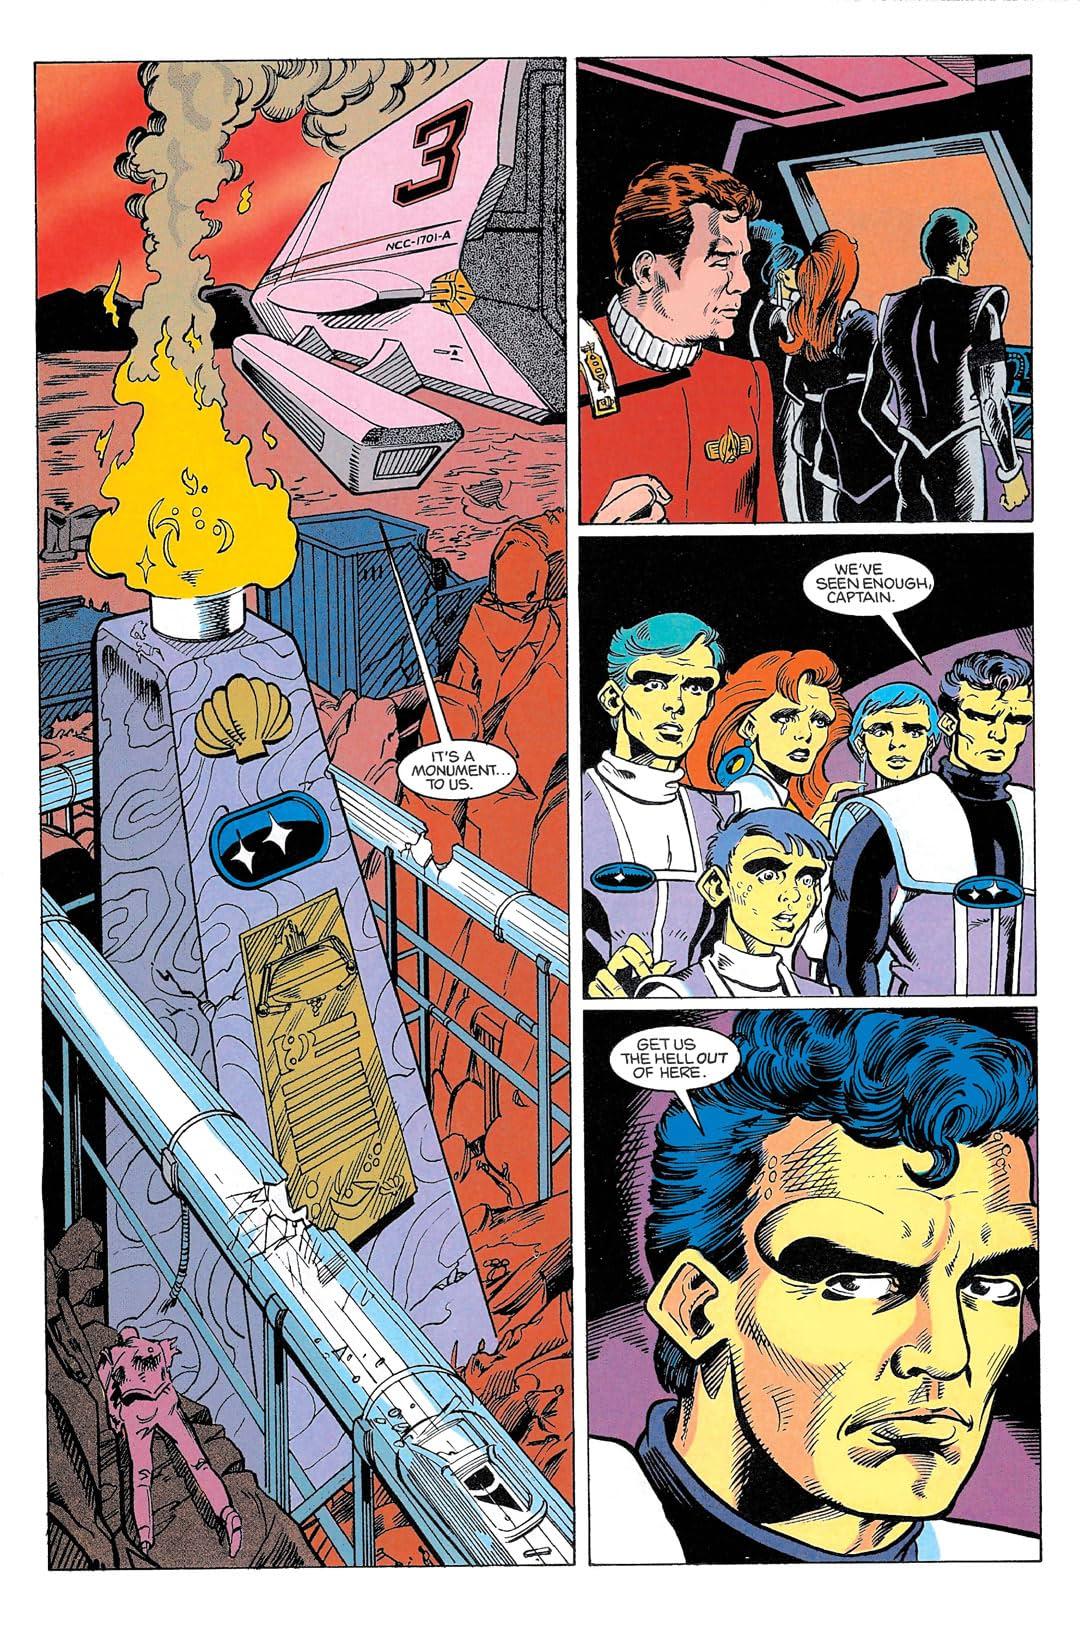 Star Trek Archives: The Best of Peter David #4